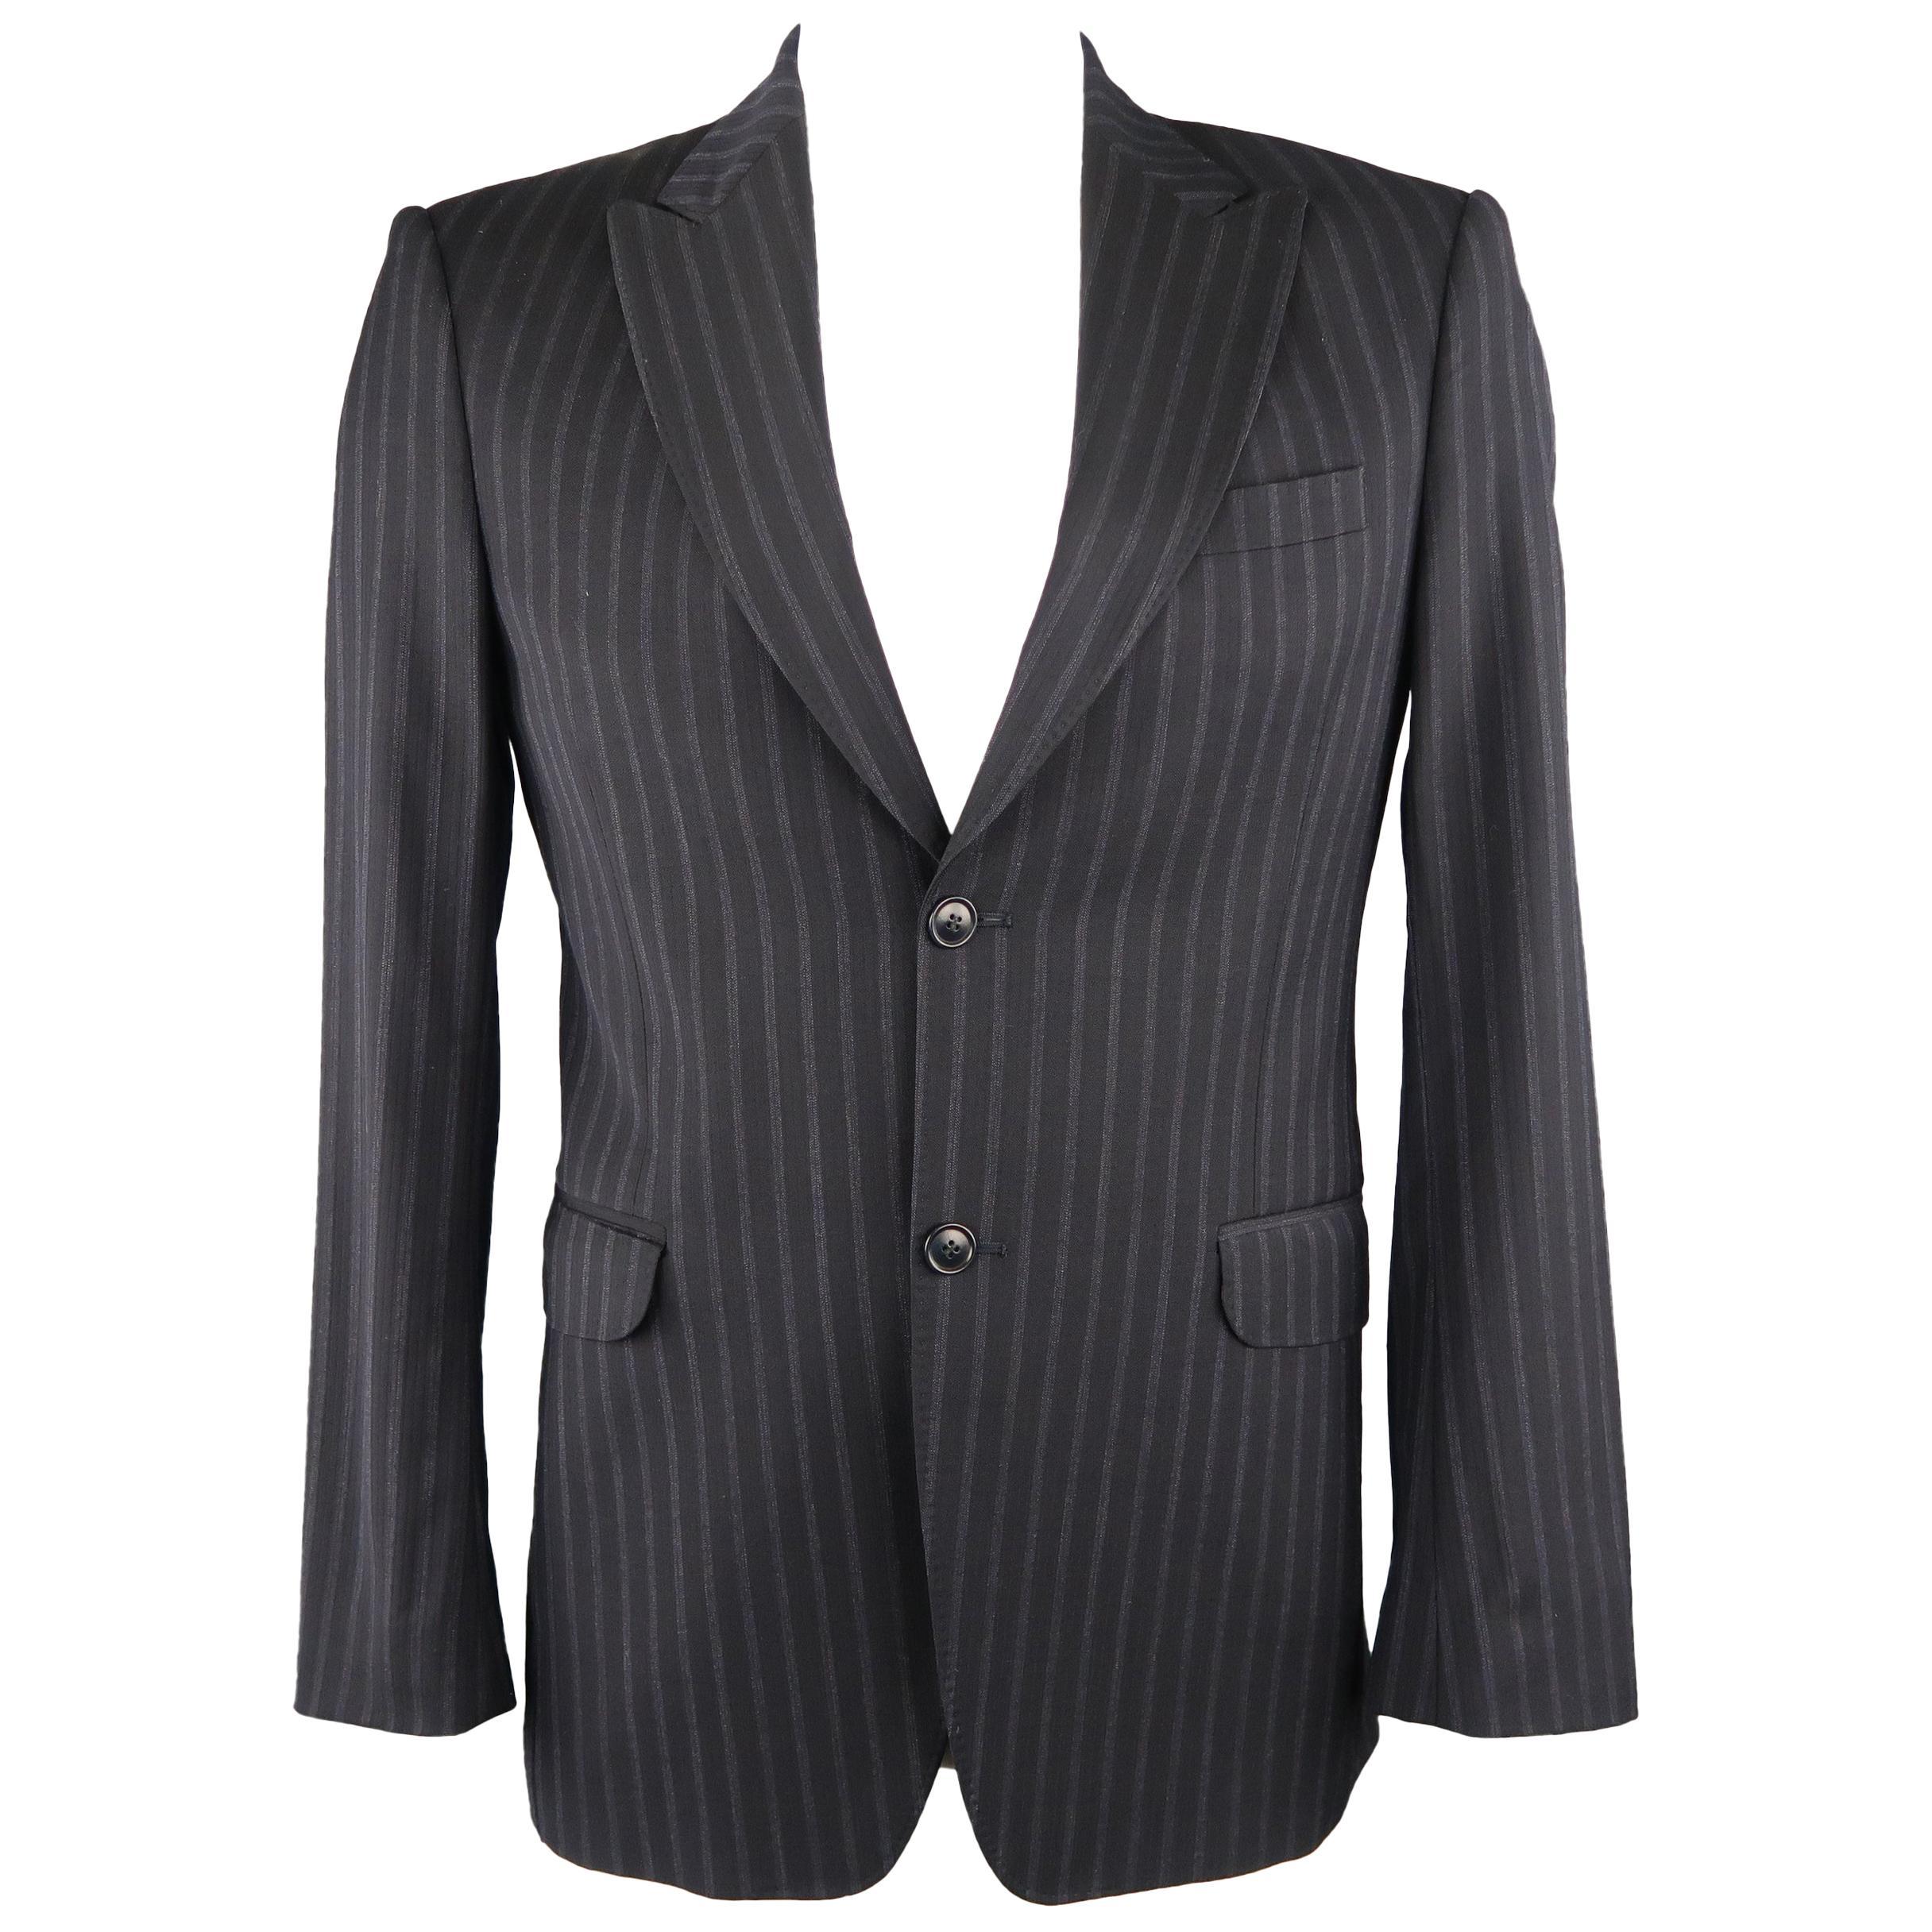 207d0f22 KENZO 38 Black Stripe Wool Sport Coat For Sale at 1stdibs